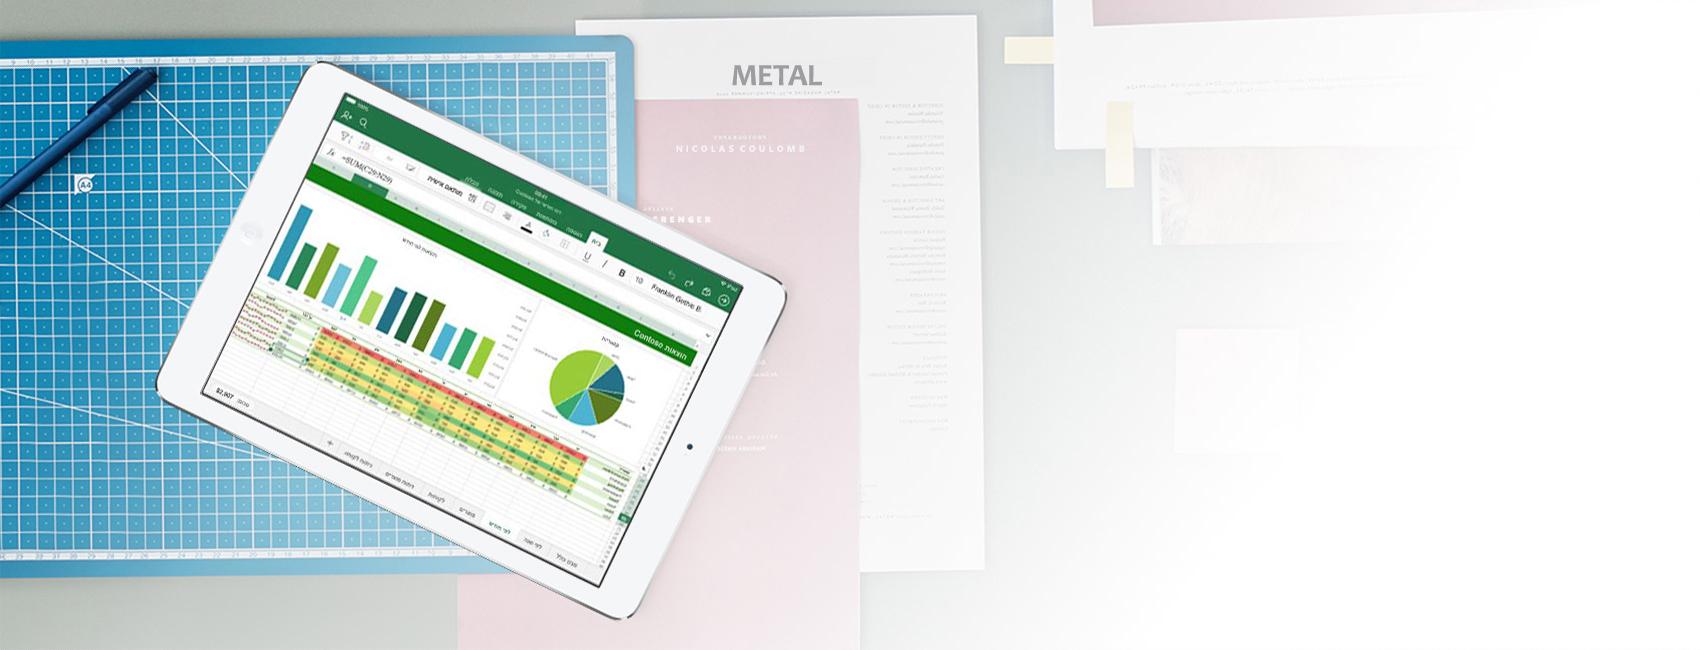 iPad המציג גיליון אלקטרוני ותרשים של Excel ביישום Excel עבור iOS